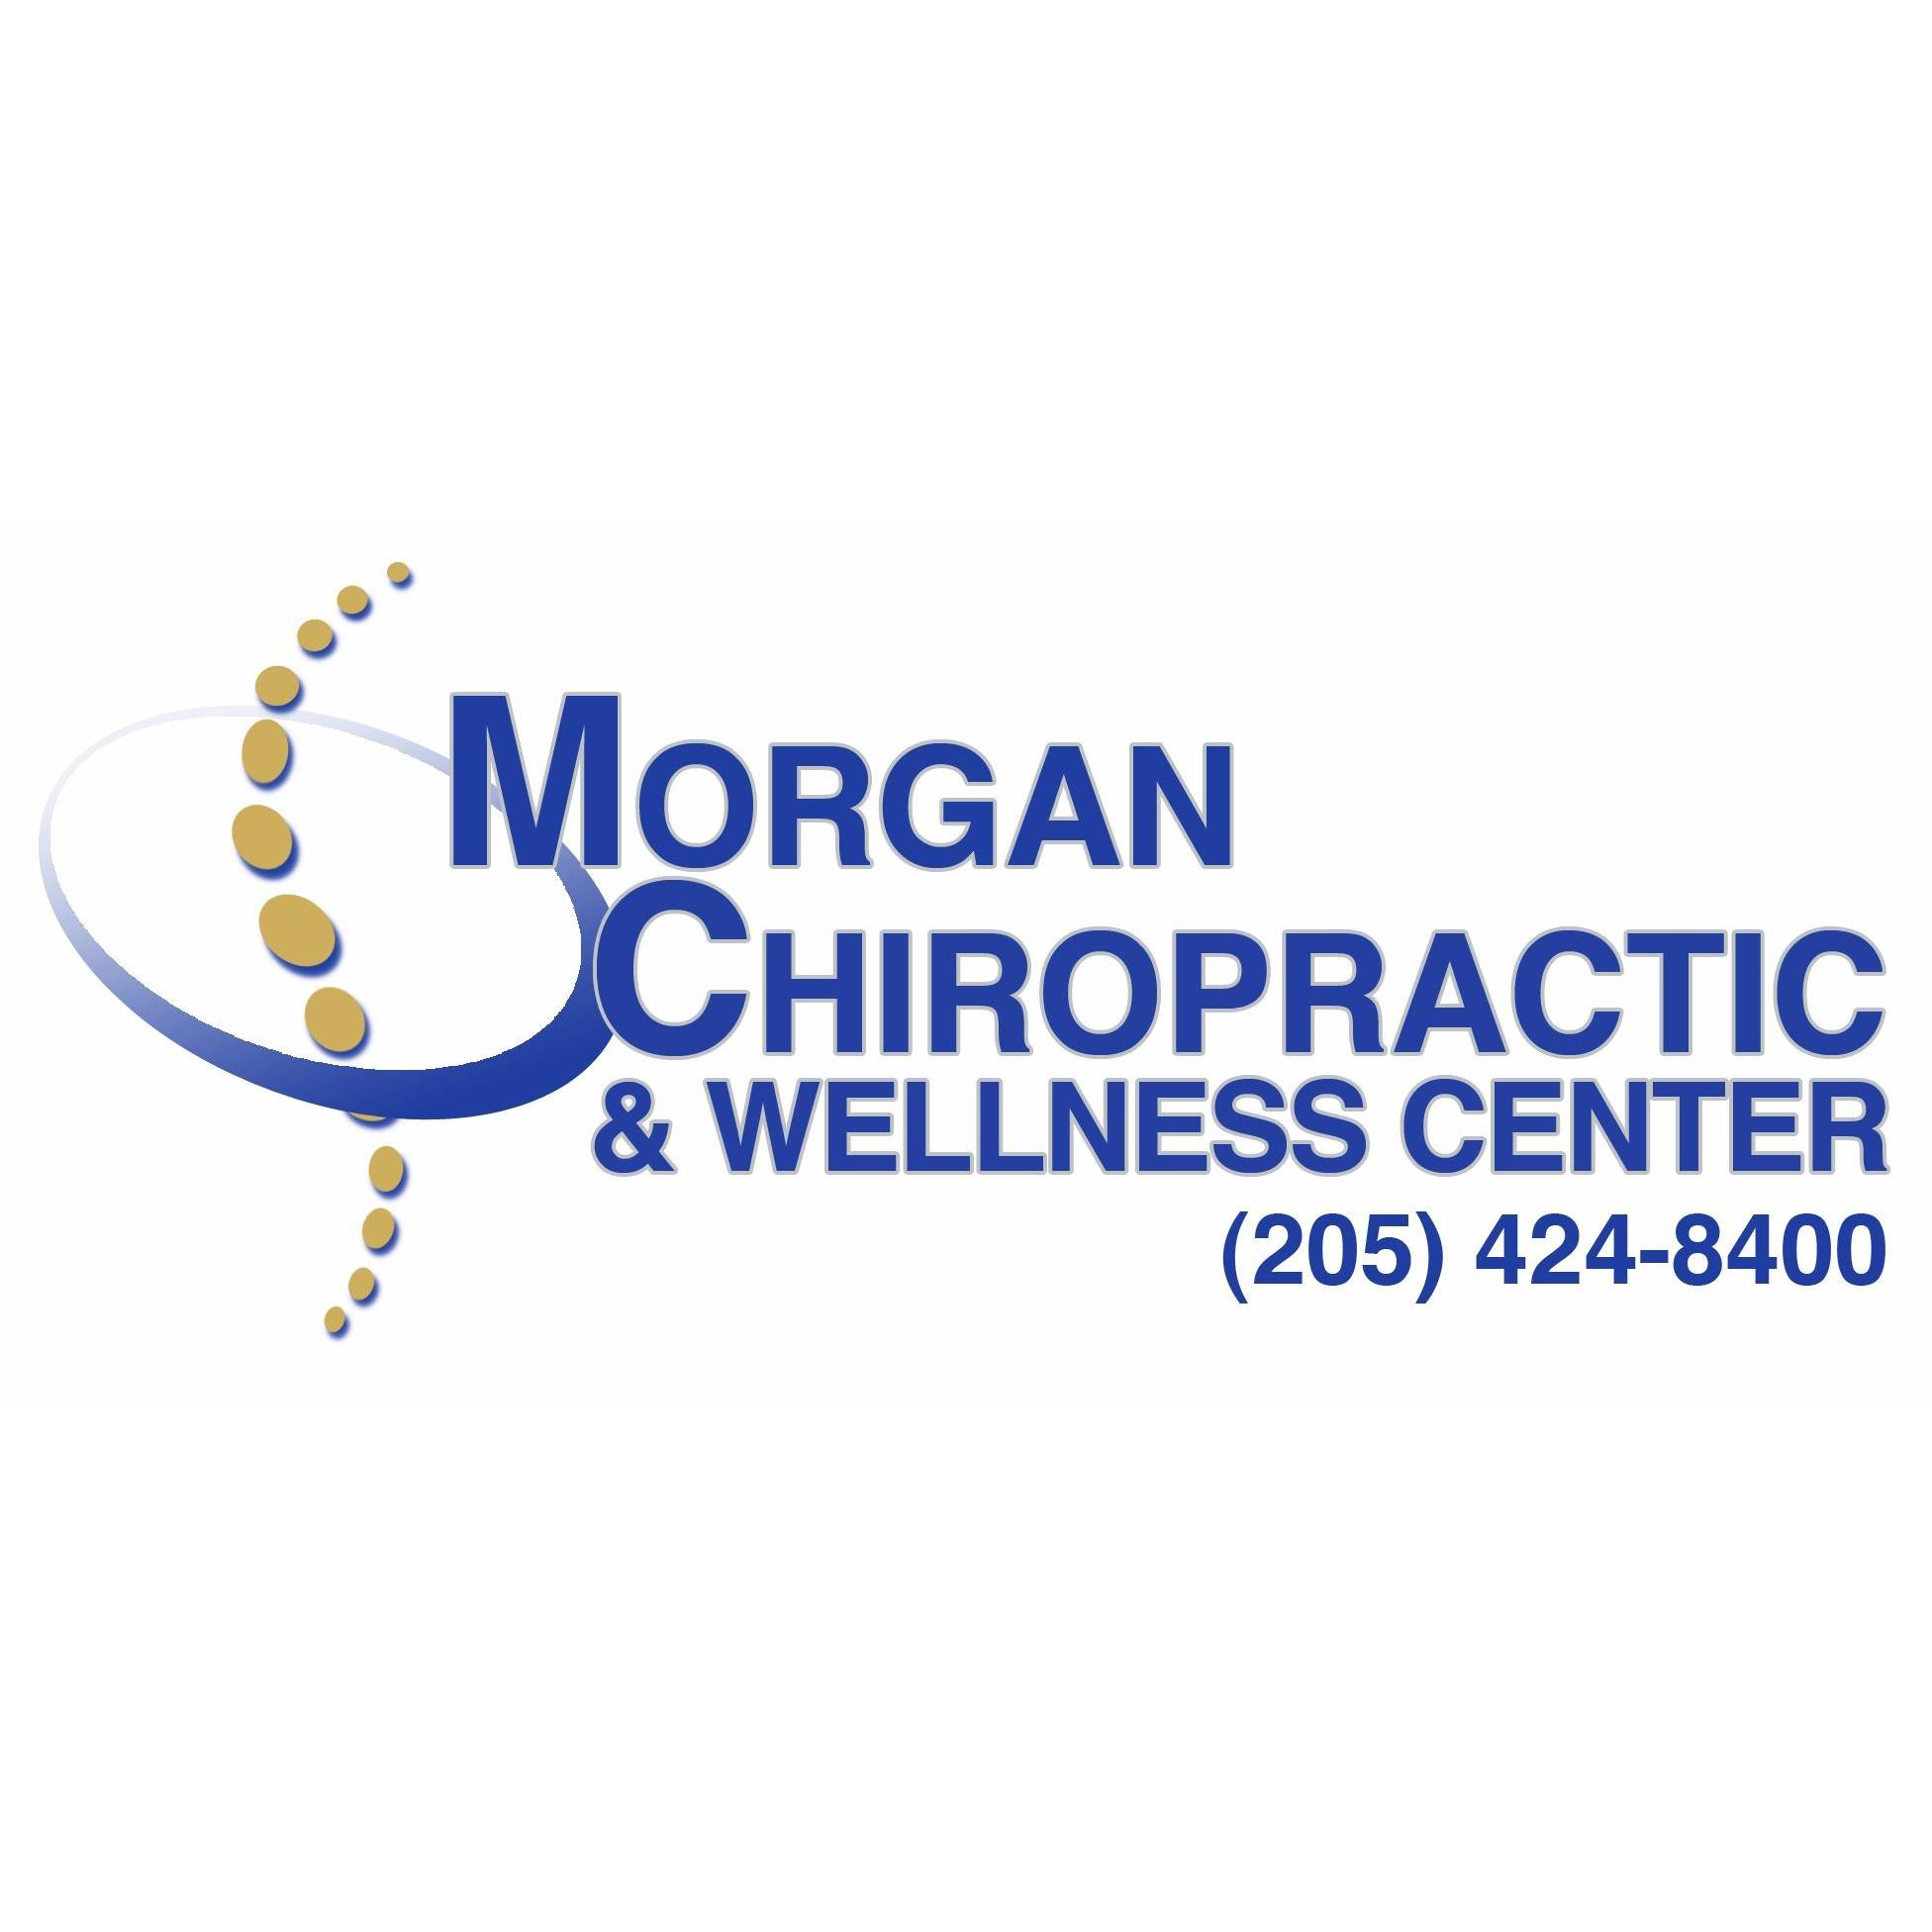 Morgan Chiropractic